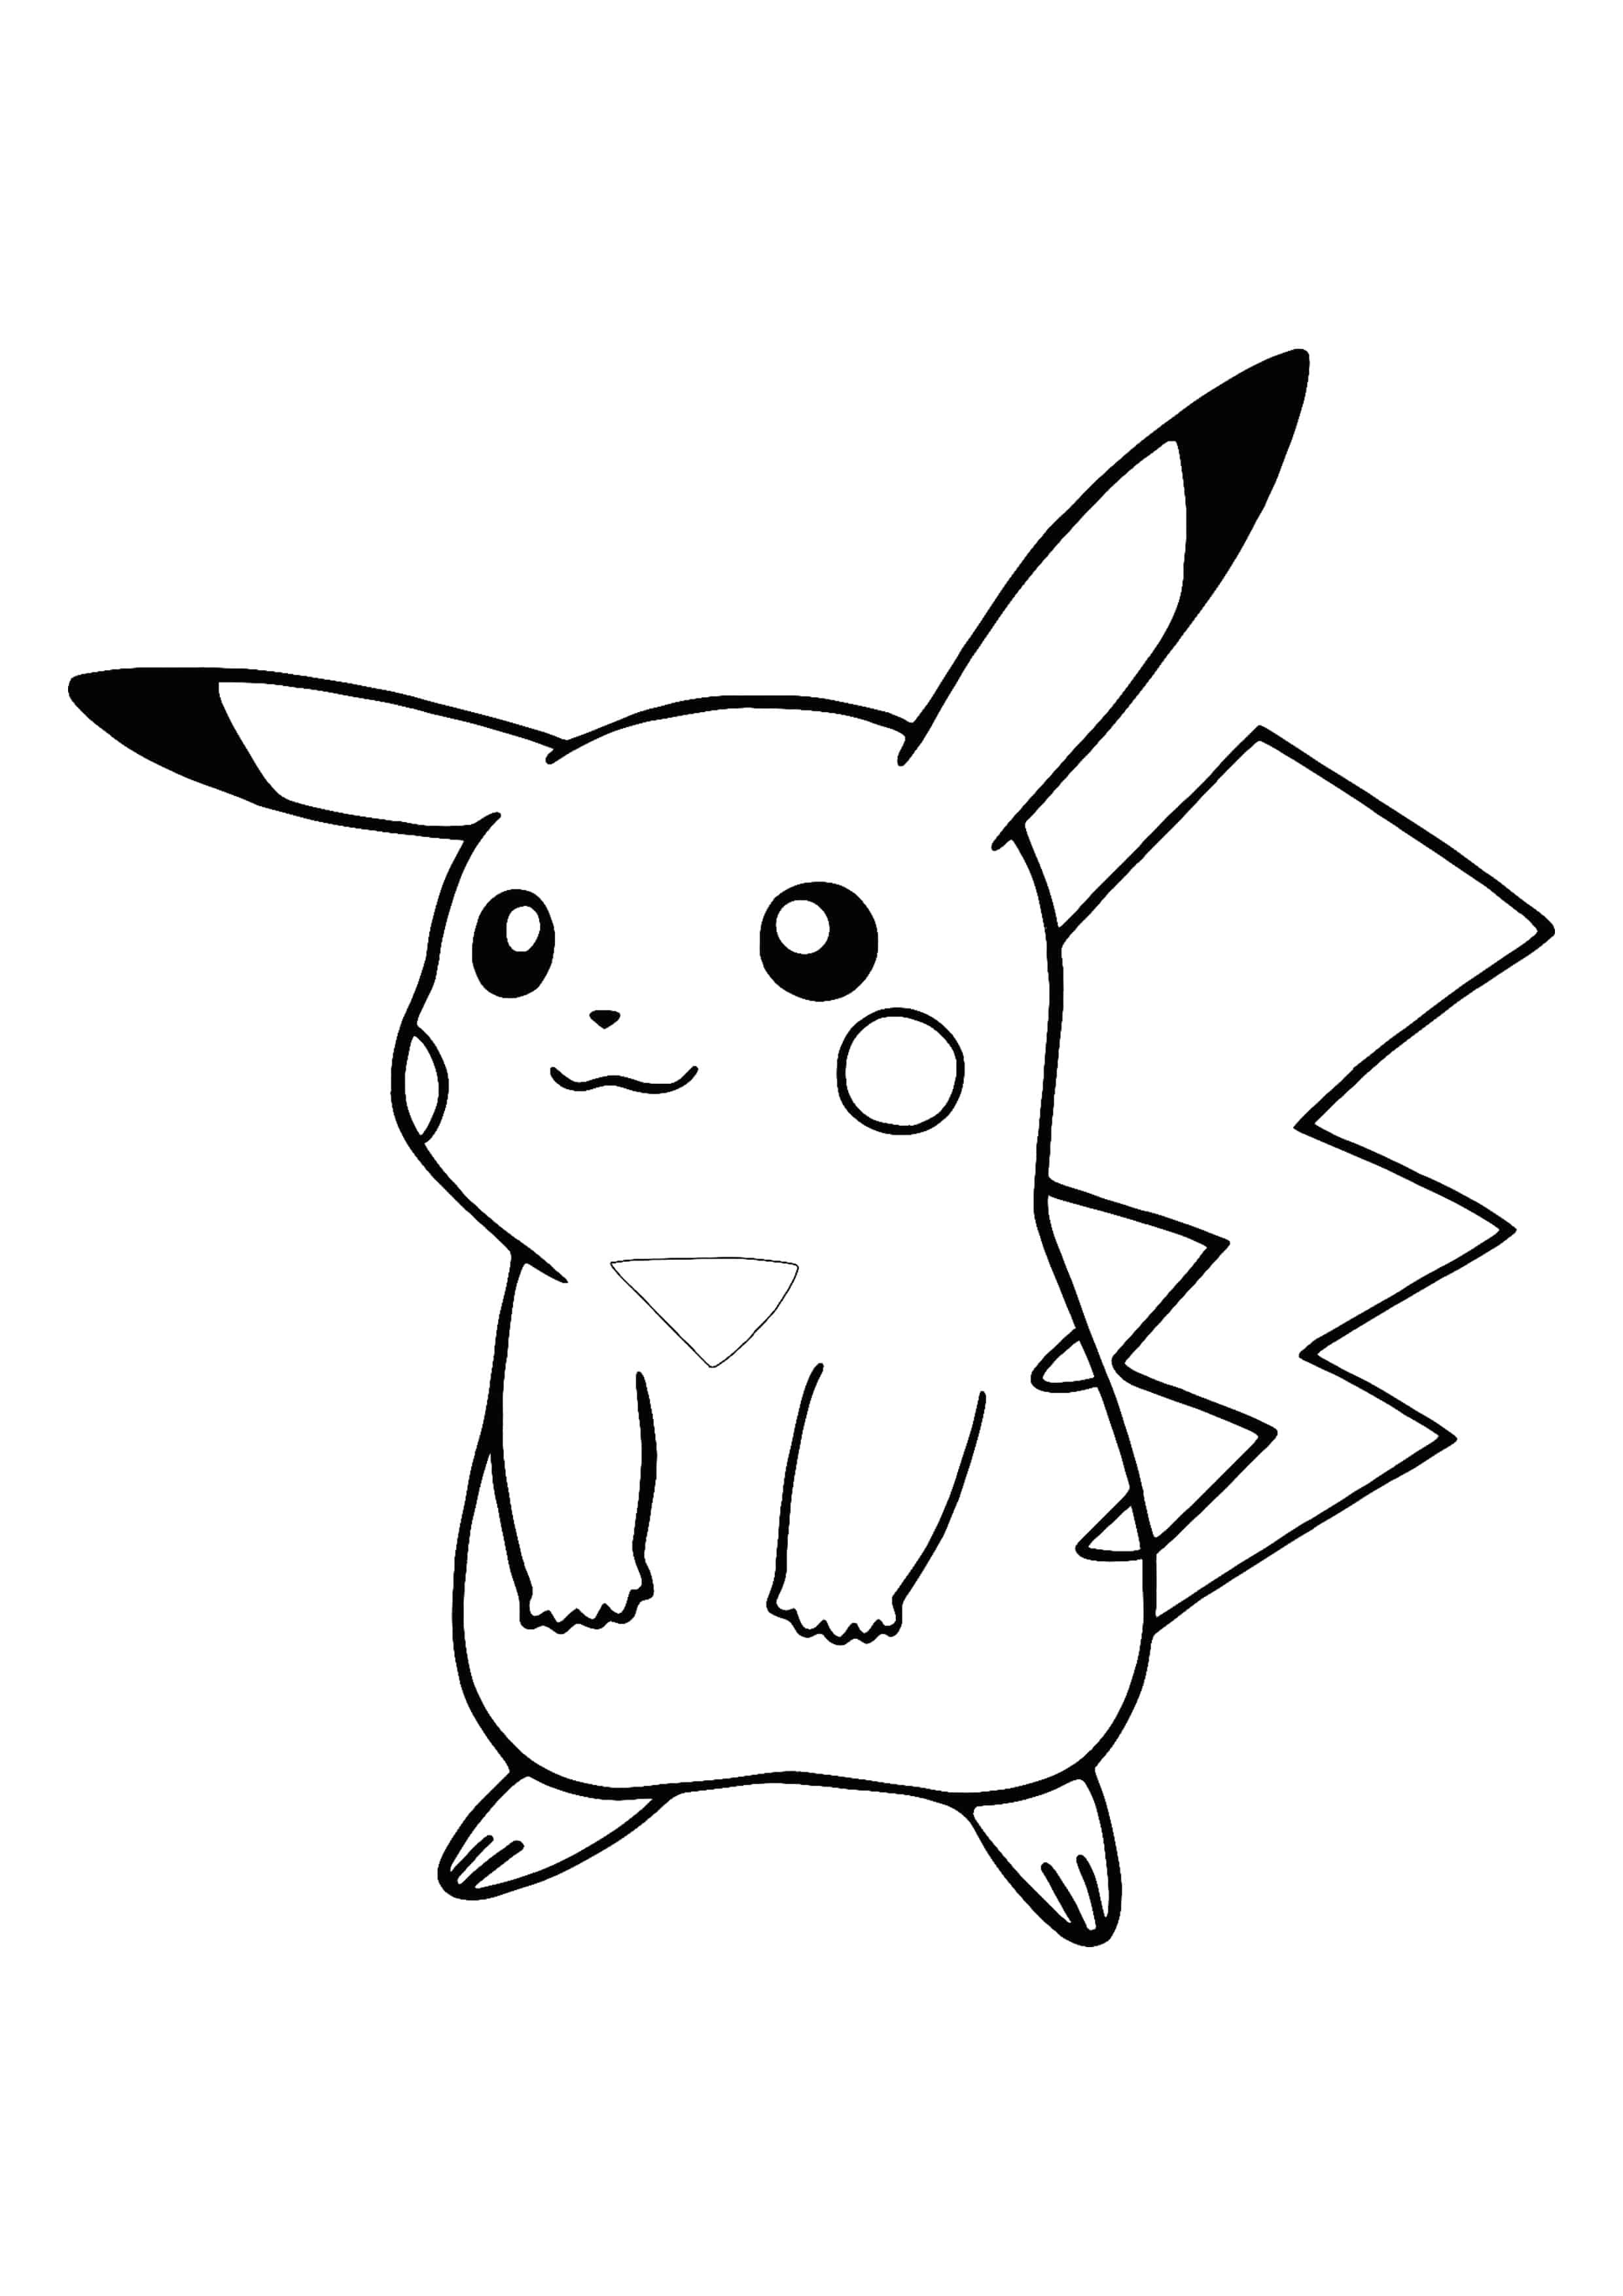 Kawaii Pikachu coloring page  Pikachu coloring page, Pokemon